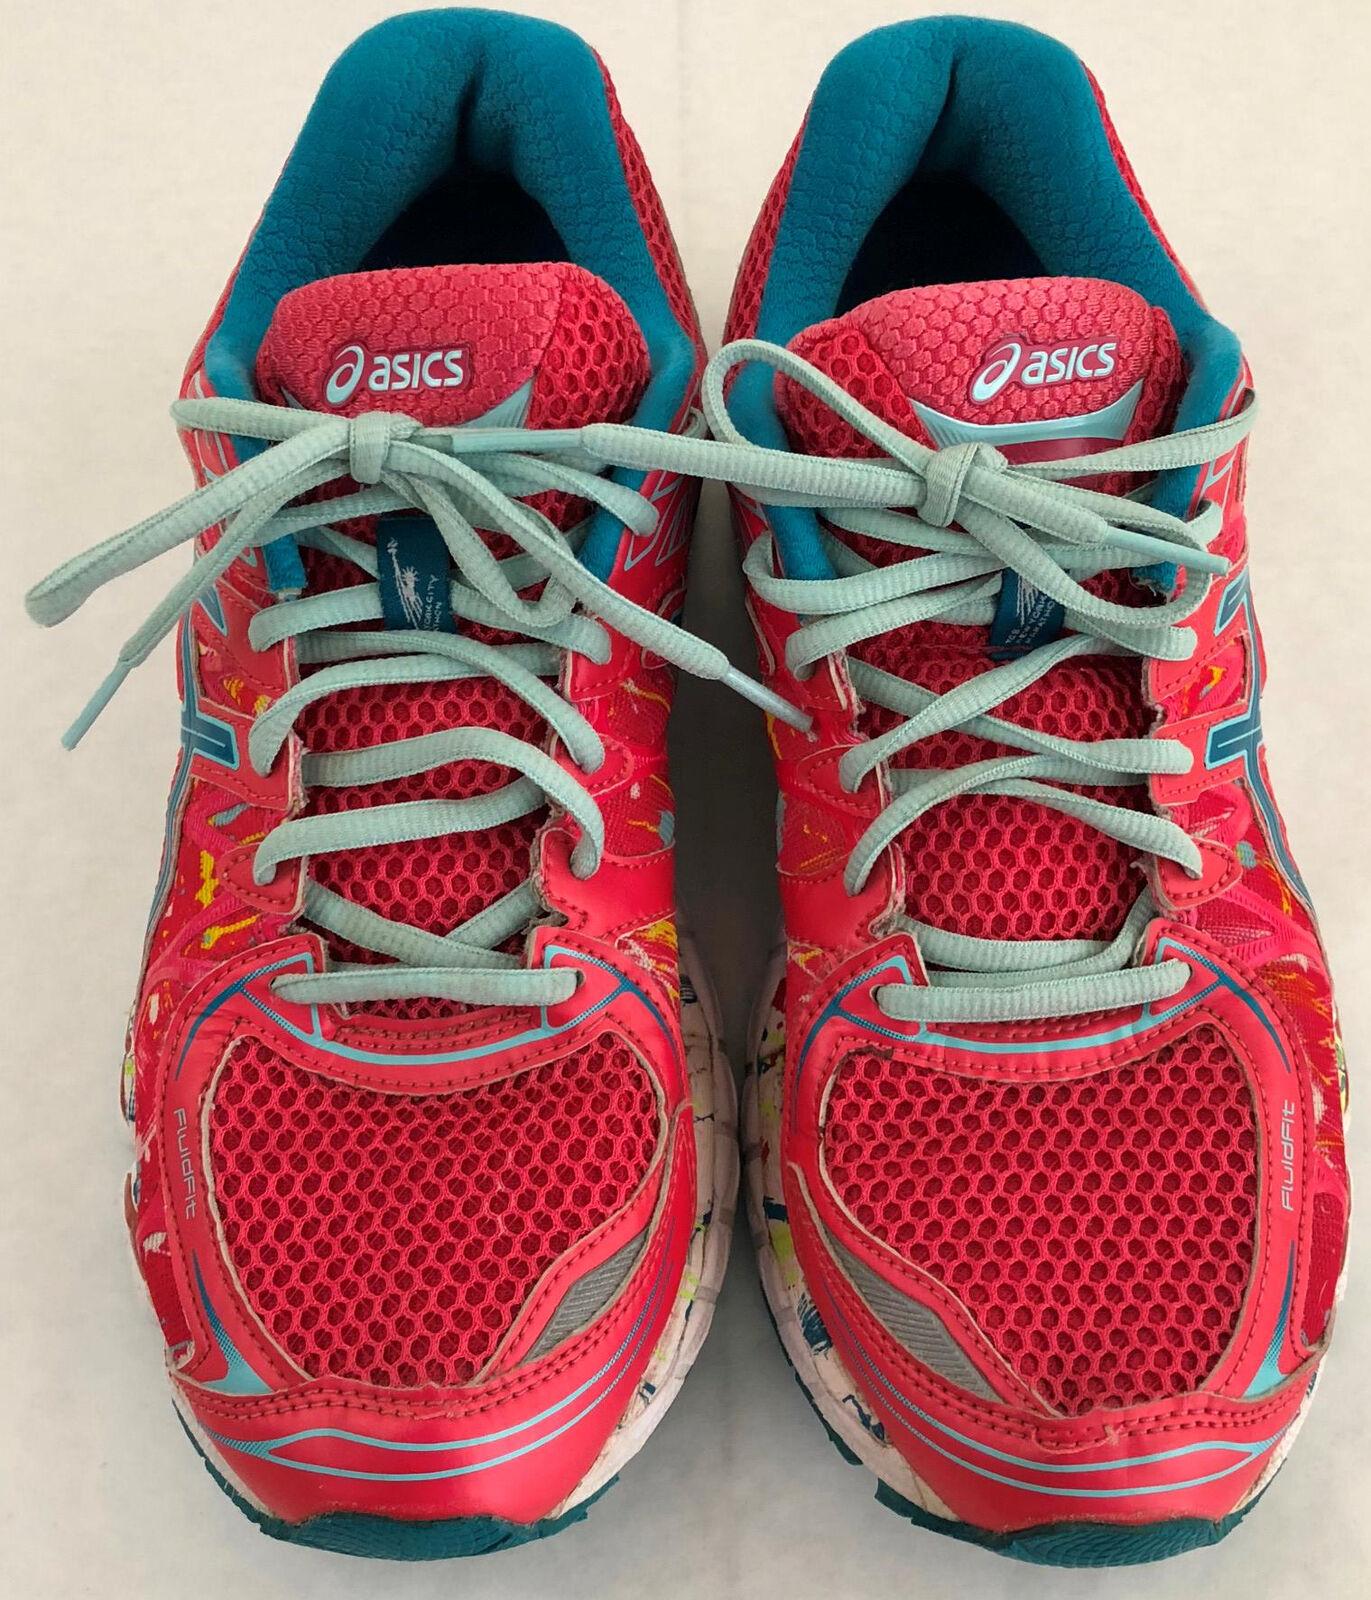 official photos fcab2 b4658 Para Mujer Asics Gel Gel Asics Nimbus 16 NYC Marathon rosado Running Zapatos  Zapatillas tamaño nos ...